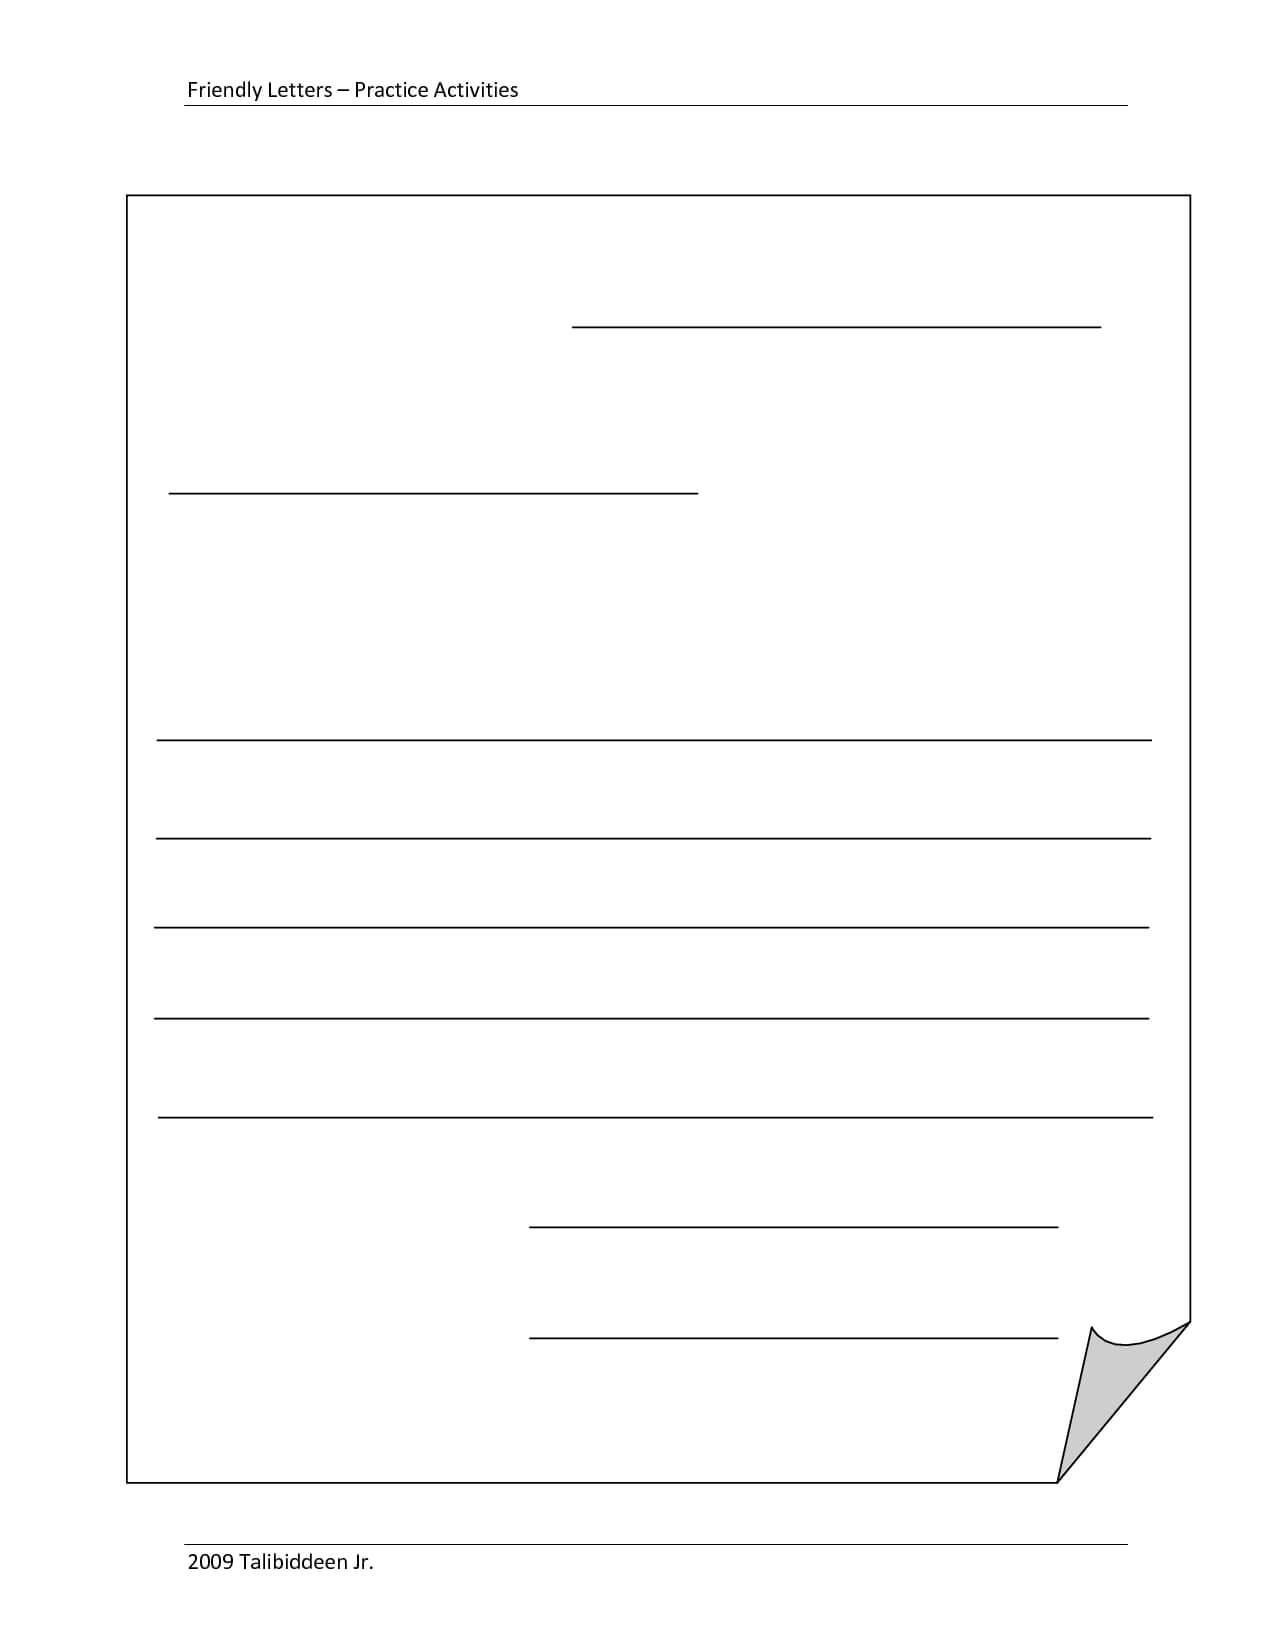 Blank+Letter+Format+Template | Letter Writing Template Pertaining To Blank Letter Writing Template For Kids